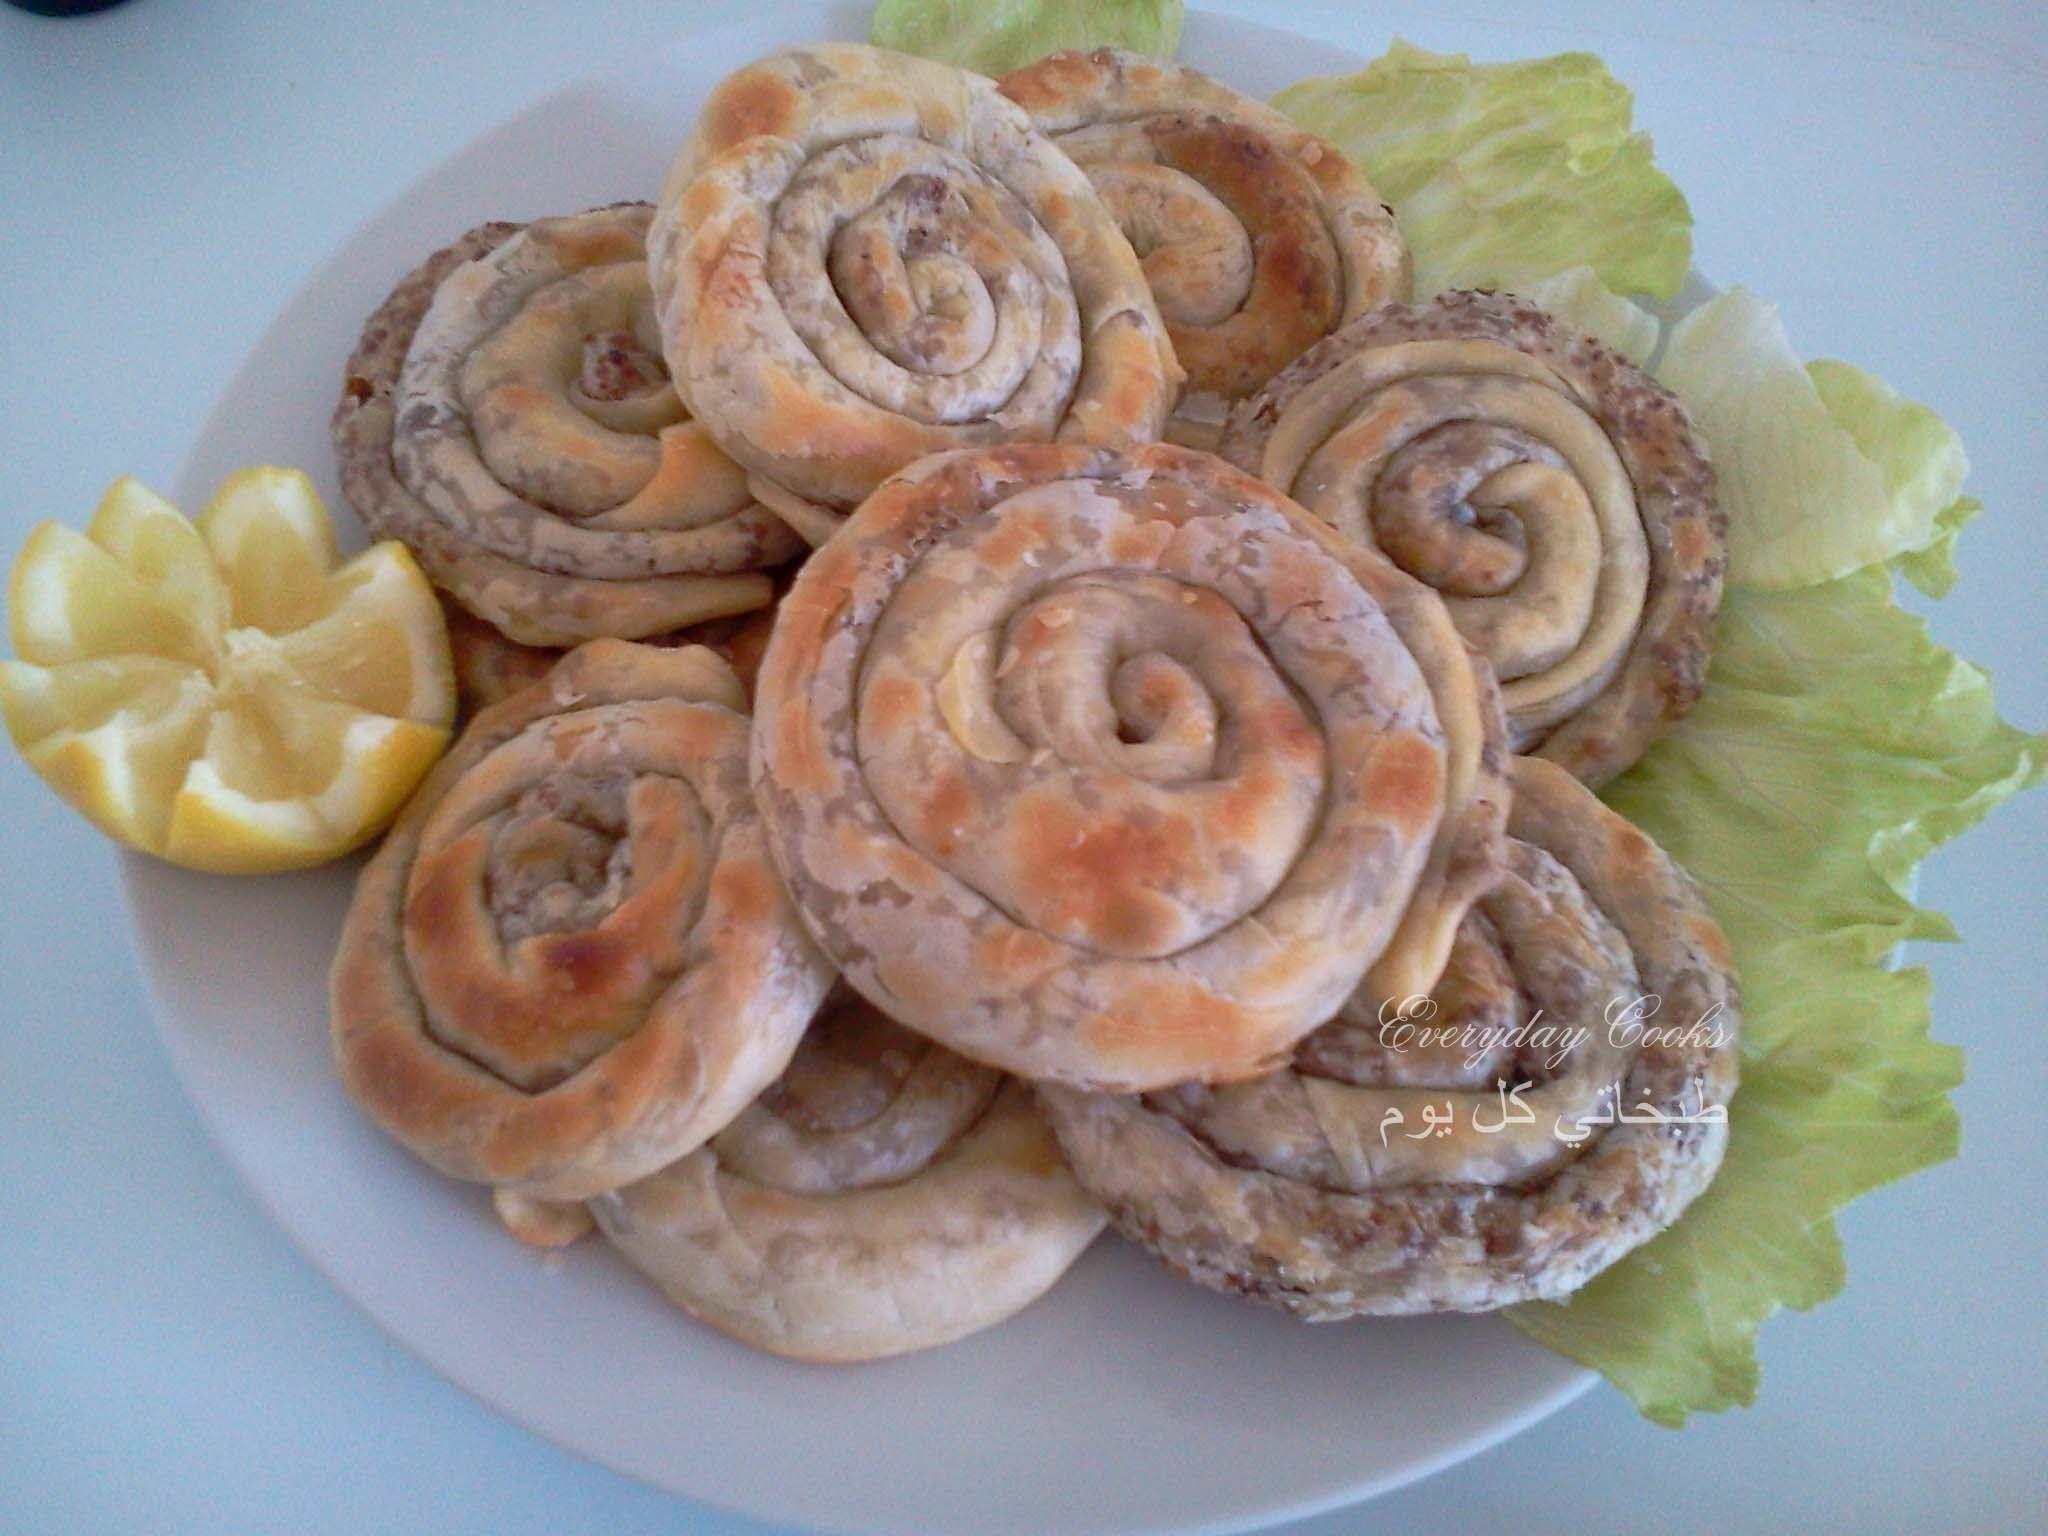 طريقة عمل اللحم بعجين الغزاويه الحلزونيه Palestinian Lahm O Agen Recipe Cc Eng Sub Youtube Savory Appetizer Food Pie Crust